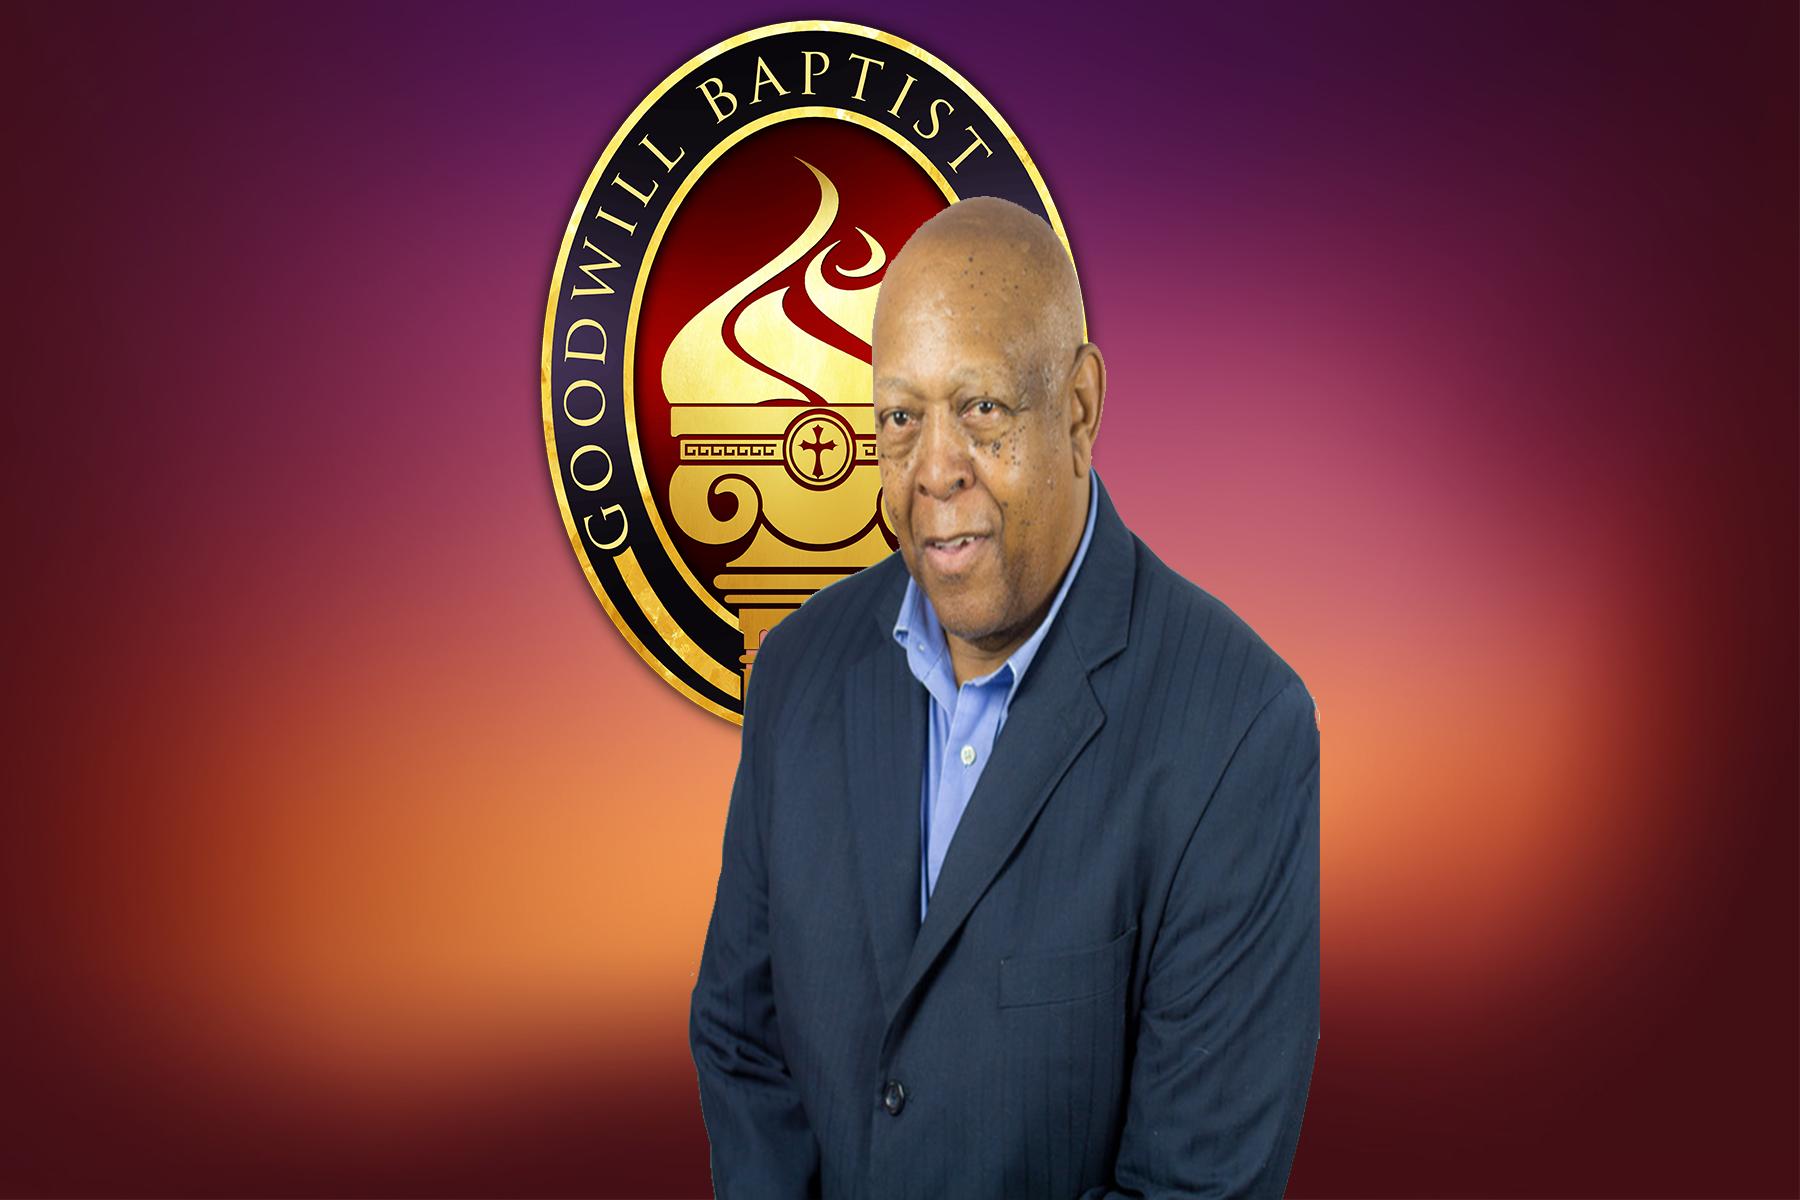 Deacon Rufus Cuthrell - Chairman of Deacon/ Media/ Transportation